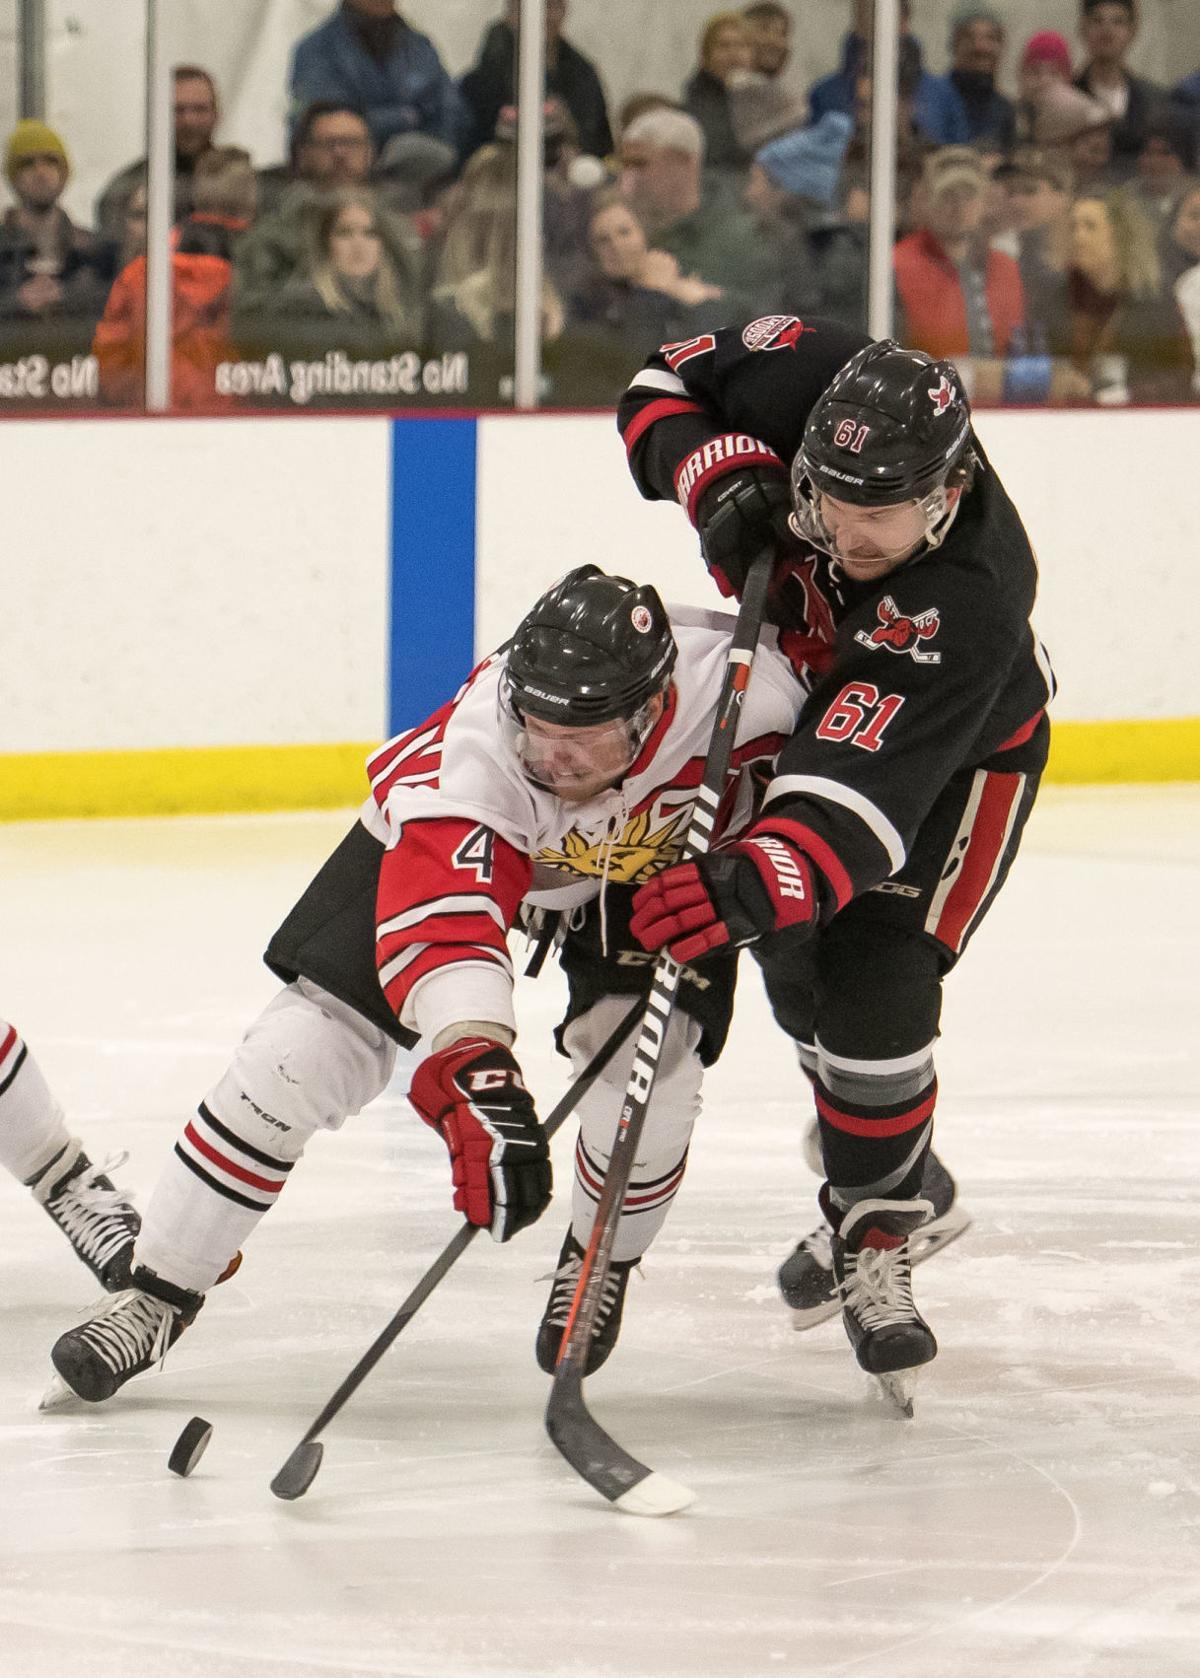 Moose hockey playoffs